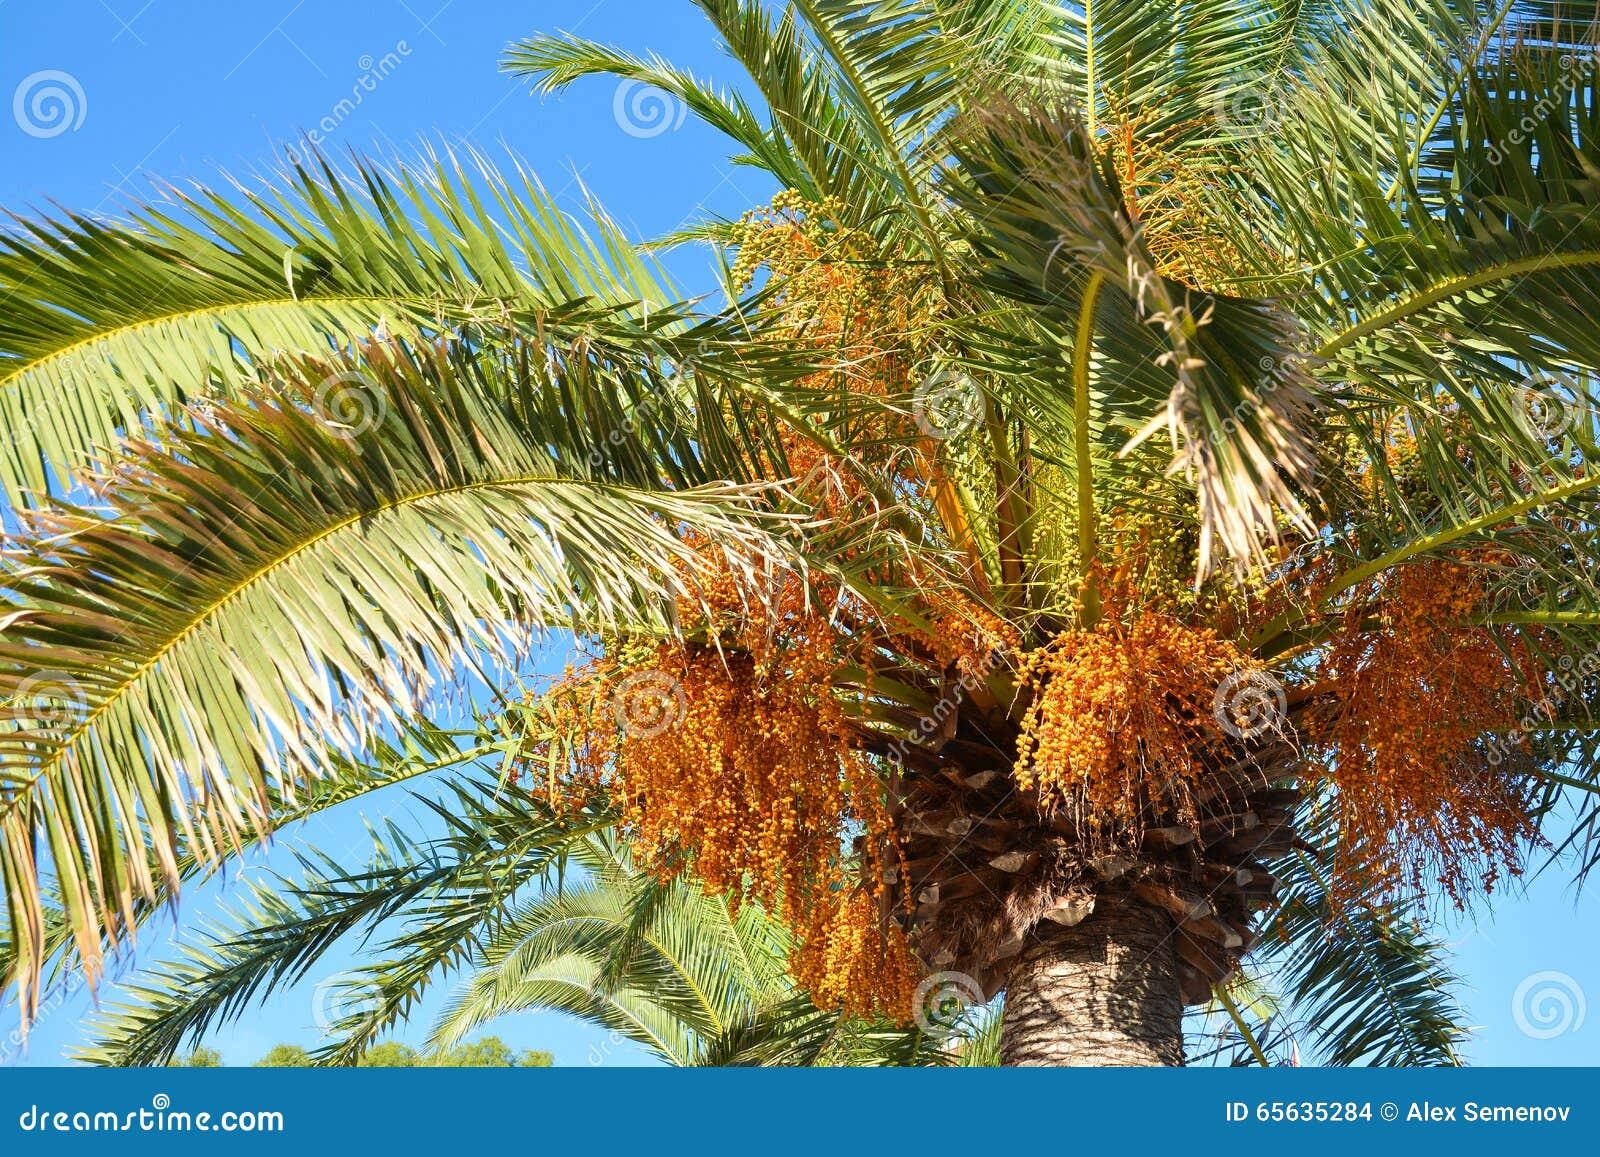 Les paumes de Crohn avec des fruits brillamment illuminés par le soleil